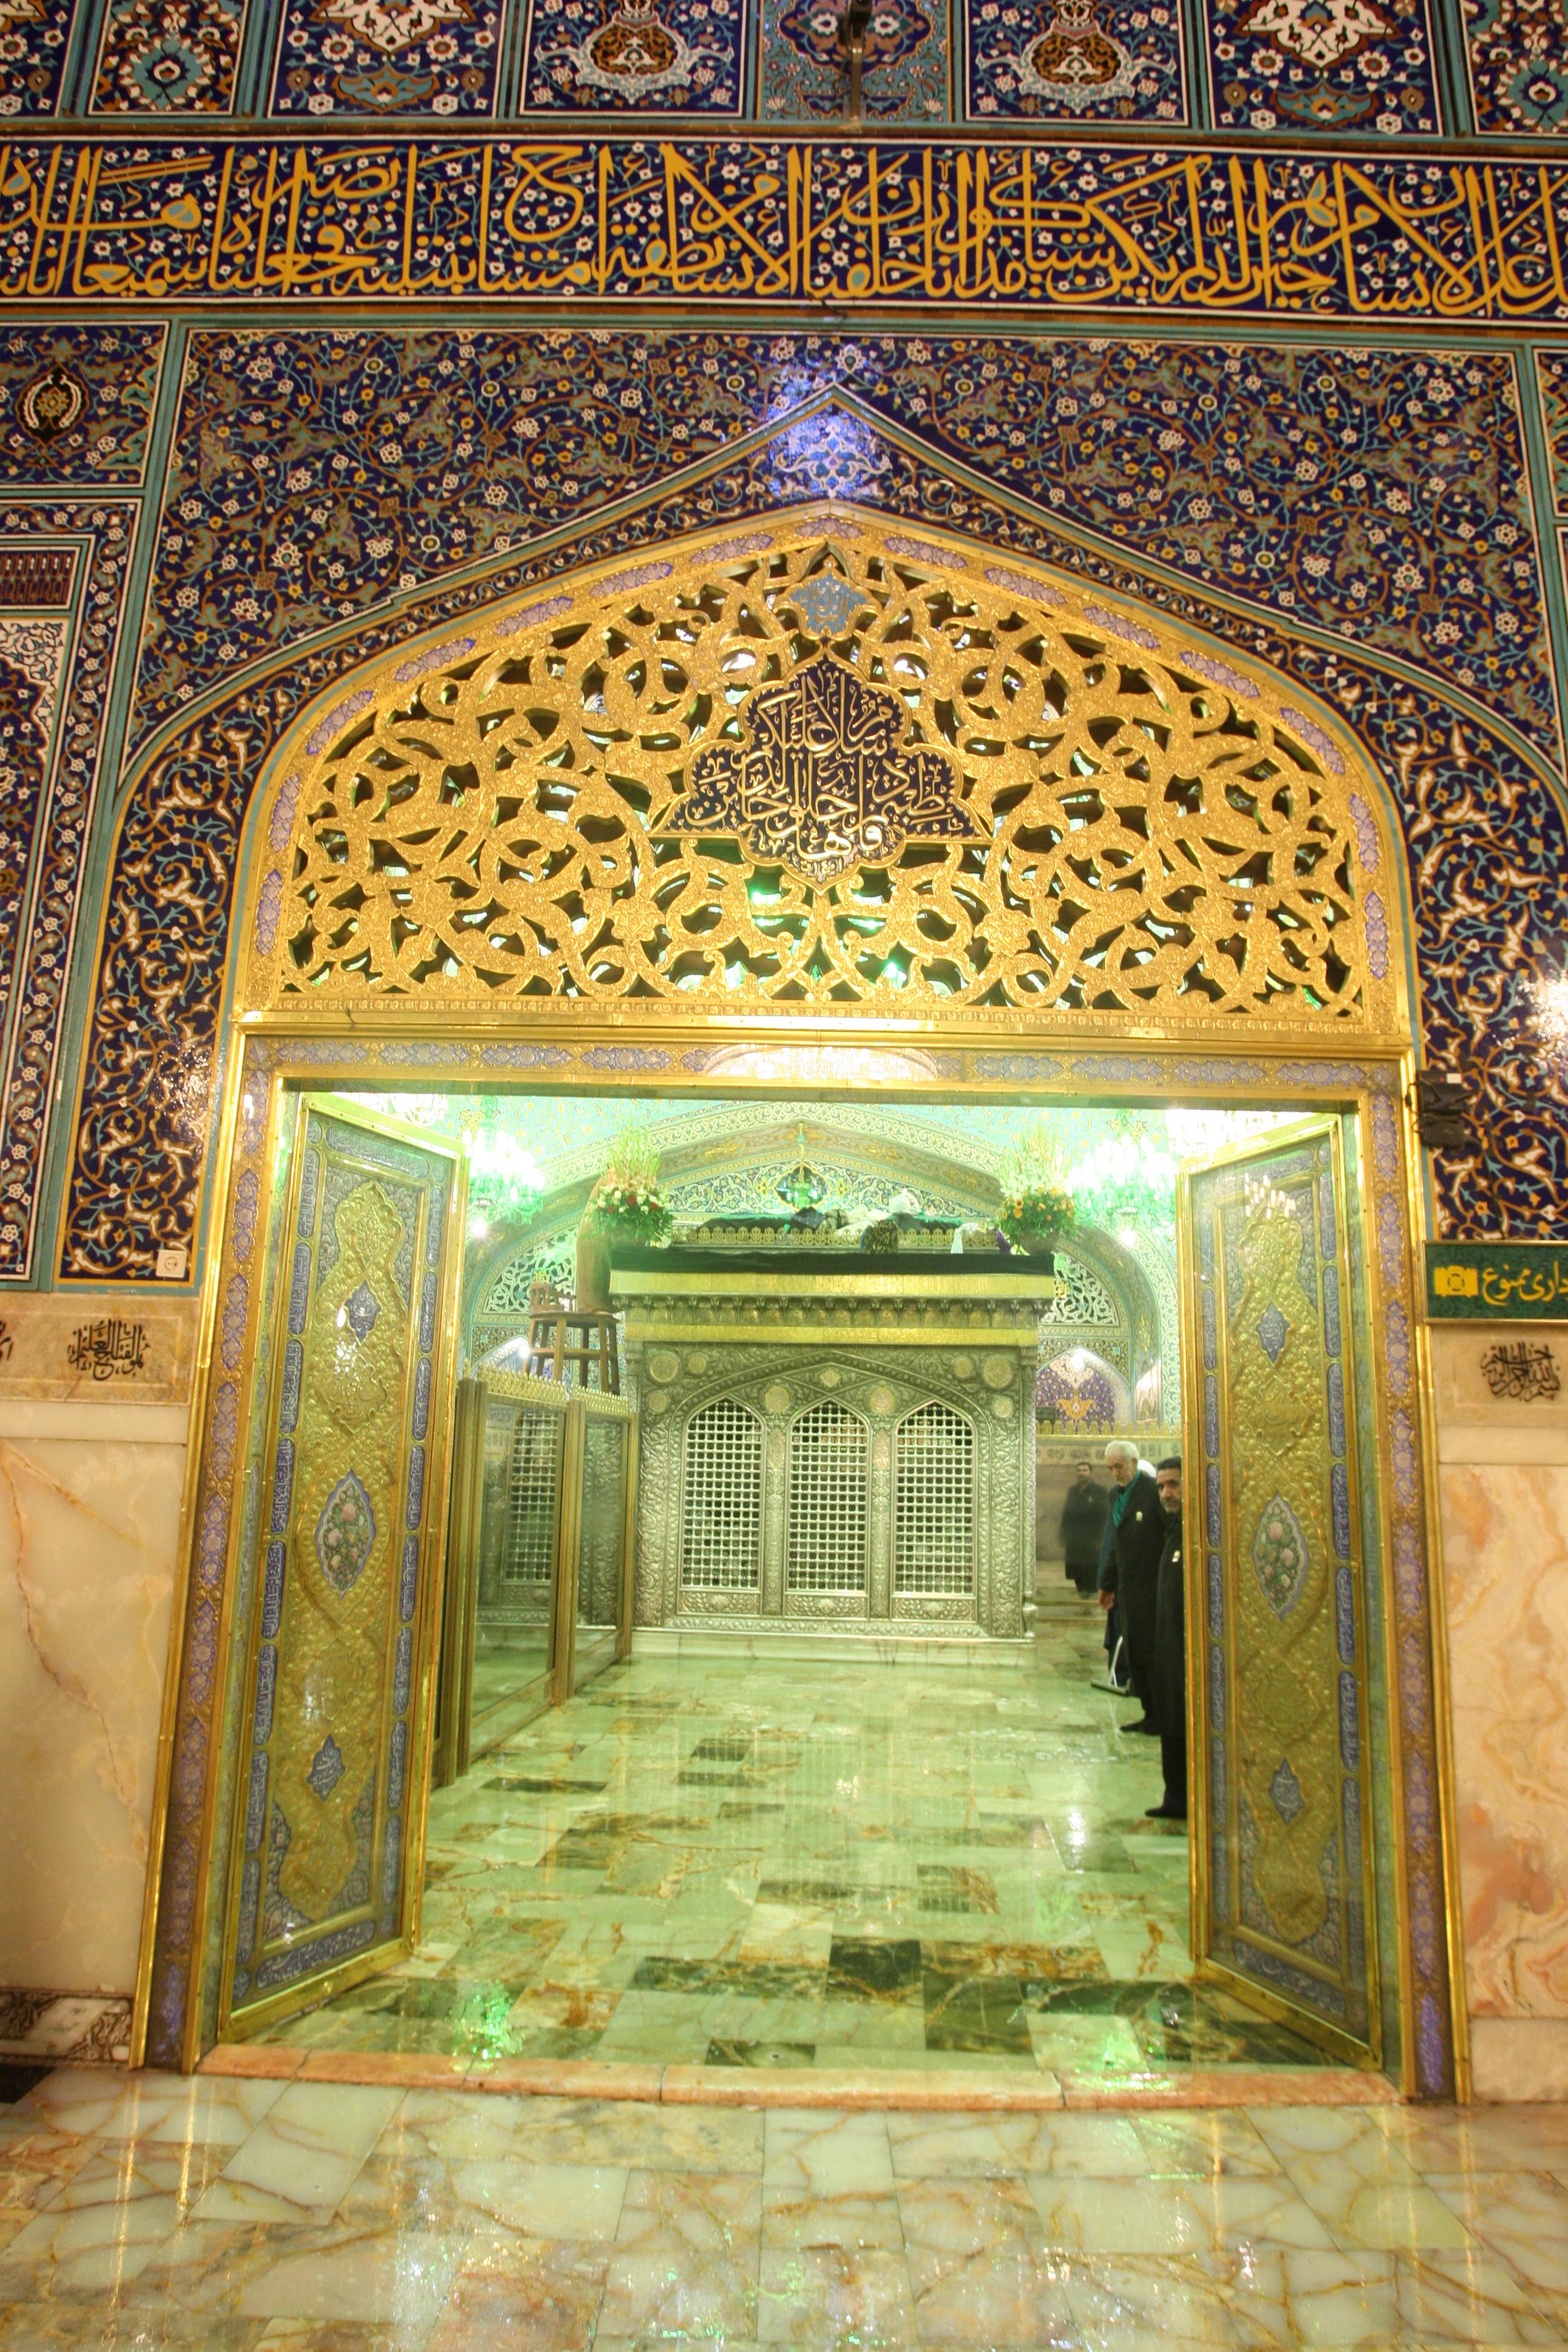 http://www.sibtayn.com/swf/gallery/images/shahrha/mashhad/reza/zarih_reza/pic3/pic24.jpg